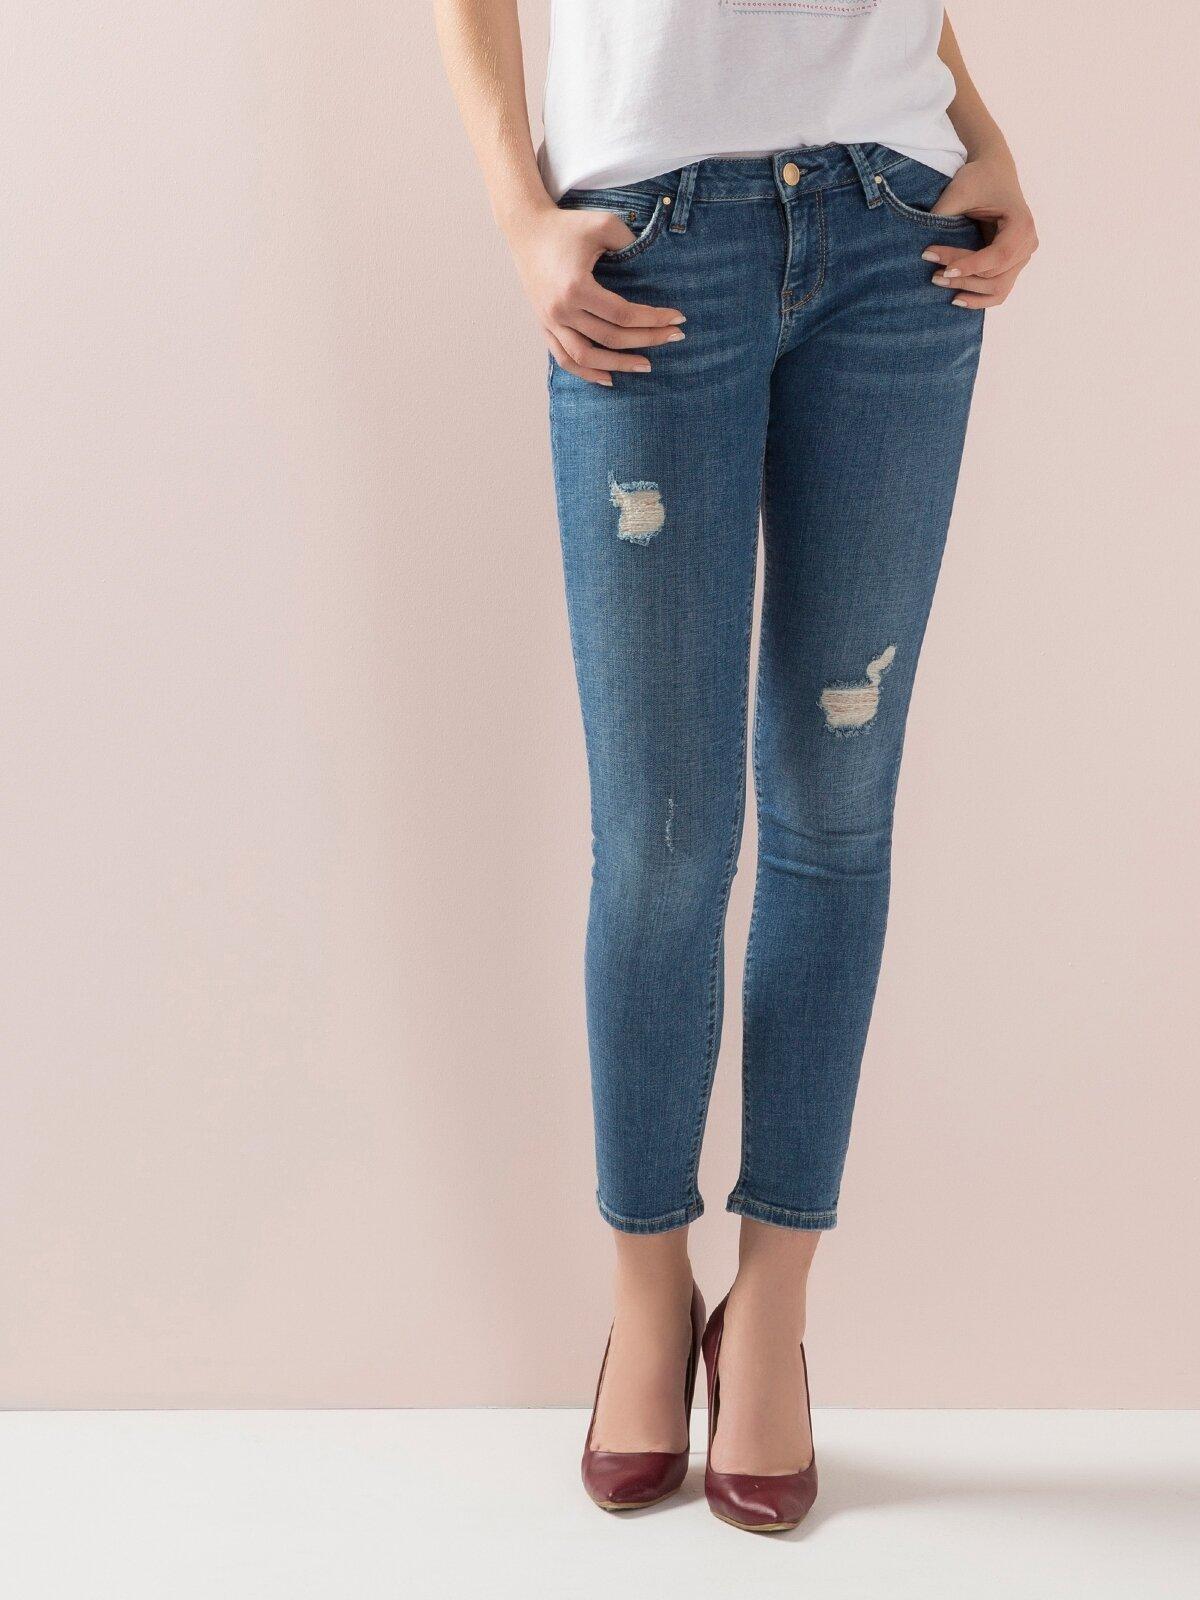 757 Sally Dar Kesim   Mavi Jean Pantolon